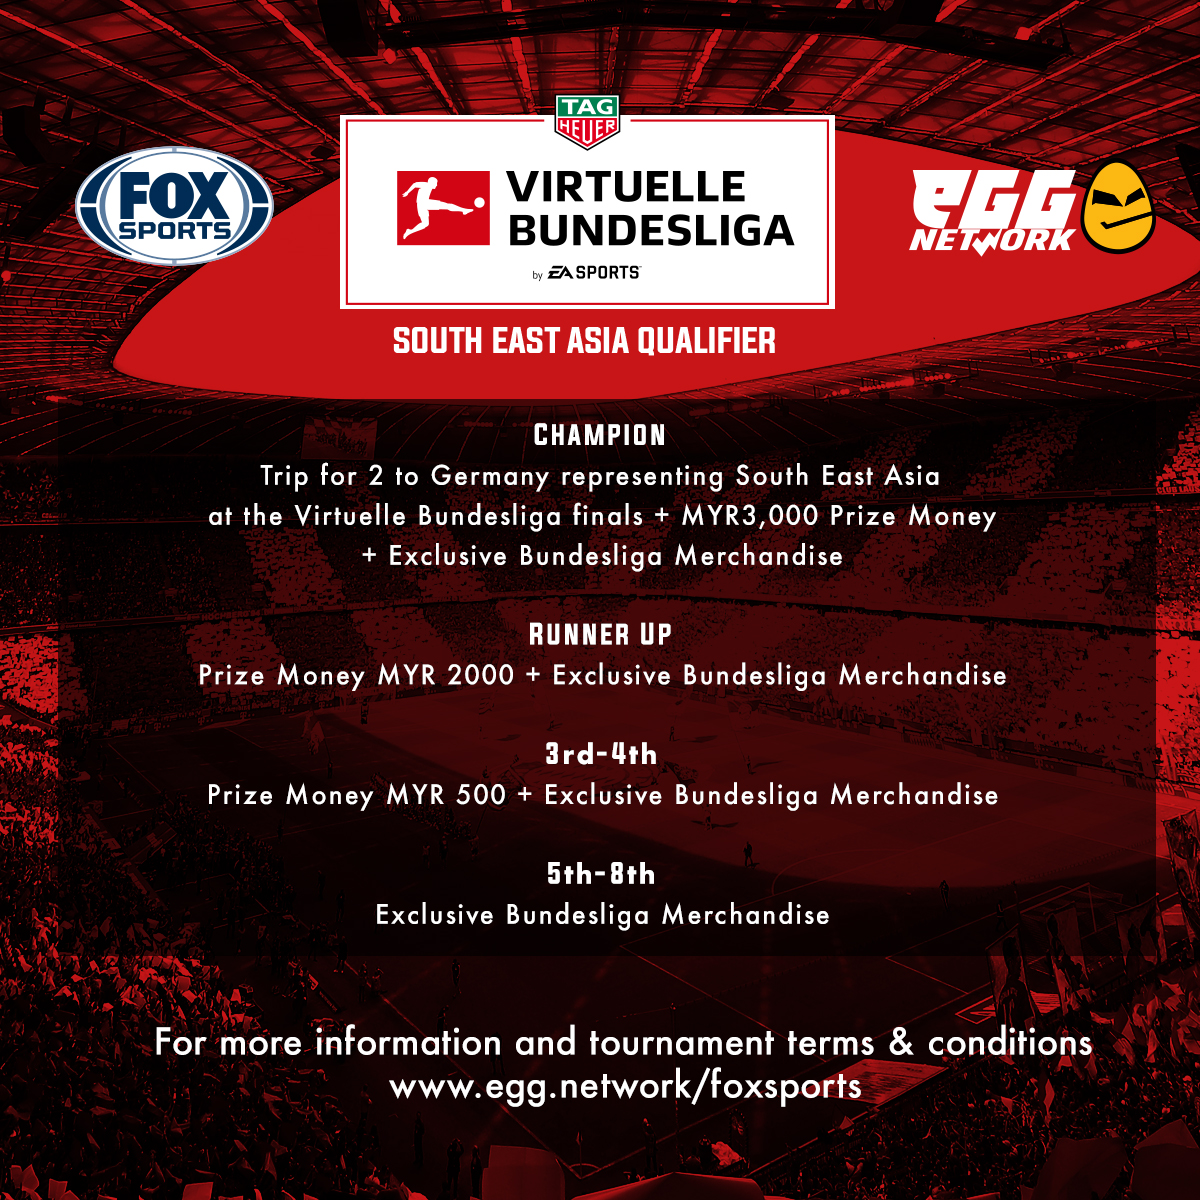 Virtuelle Bundesliga Prizes.jpg